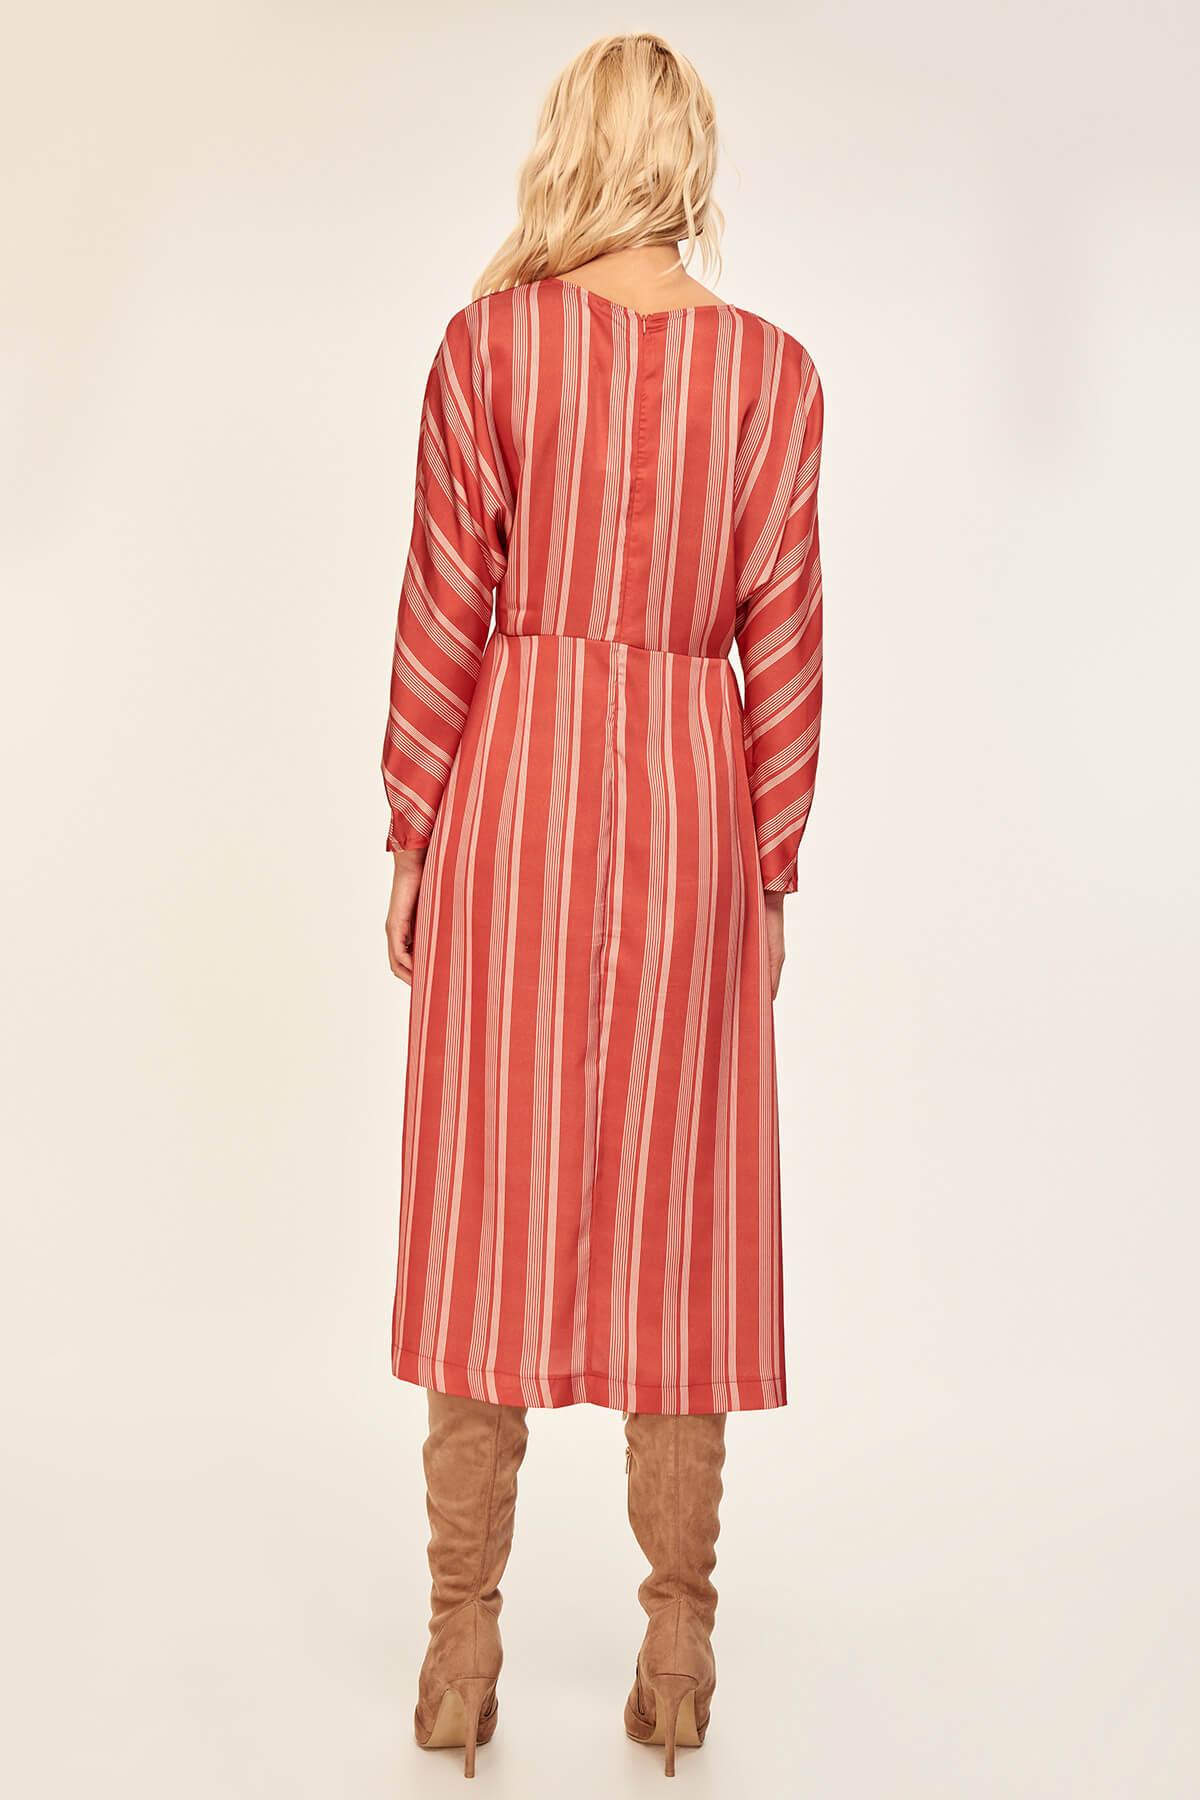 Trendyol Tile Striped Dress TOFAW19LE0042 4